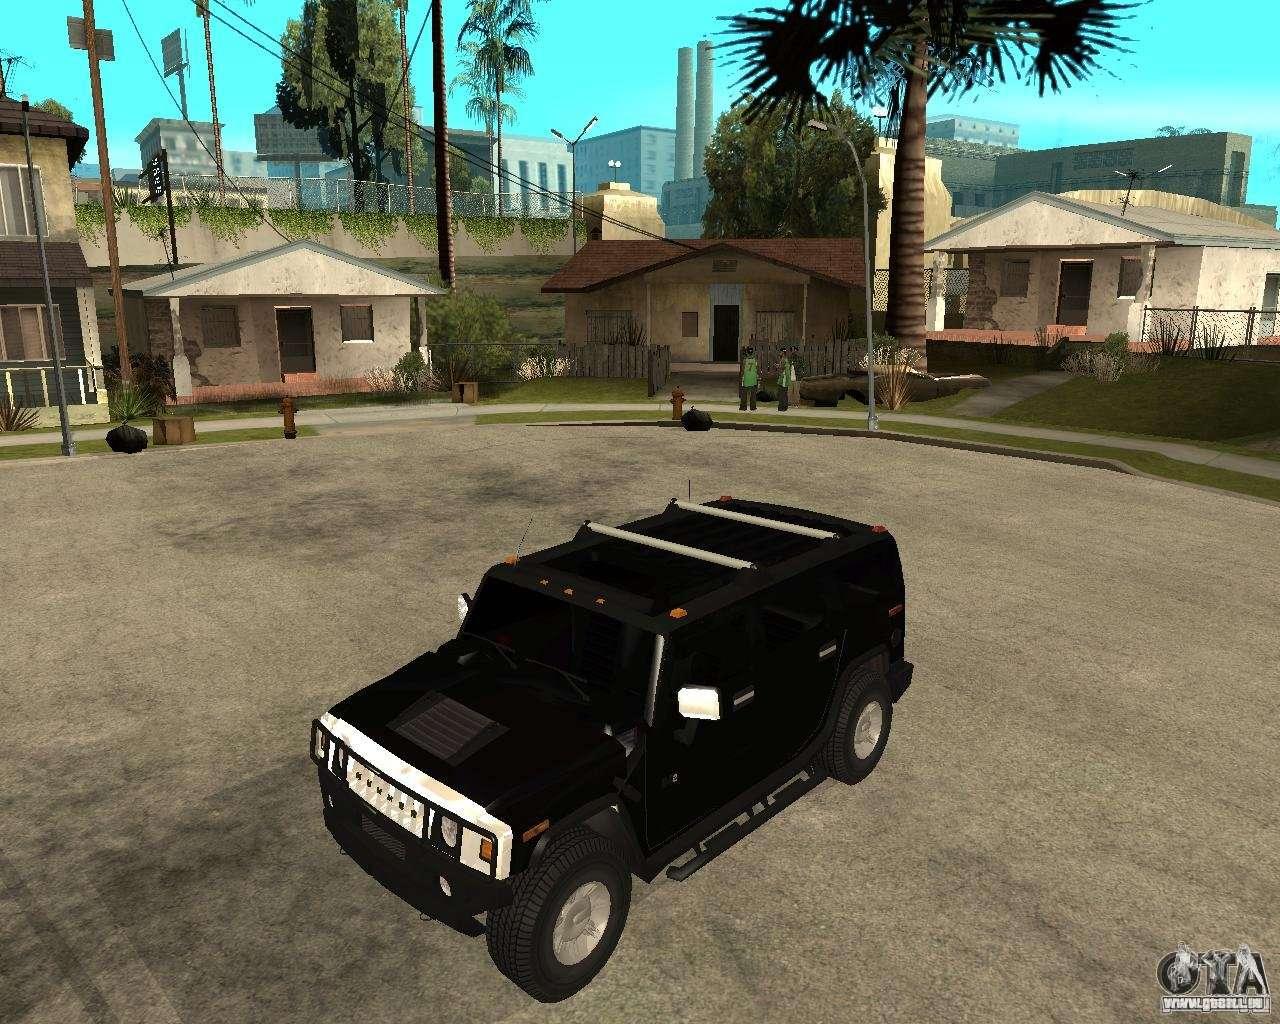 AMG H12 HUMMER SUV FBI für GTA San Andreas | amg hummer